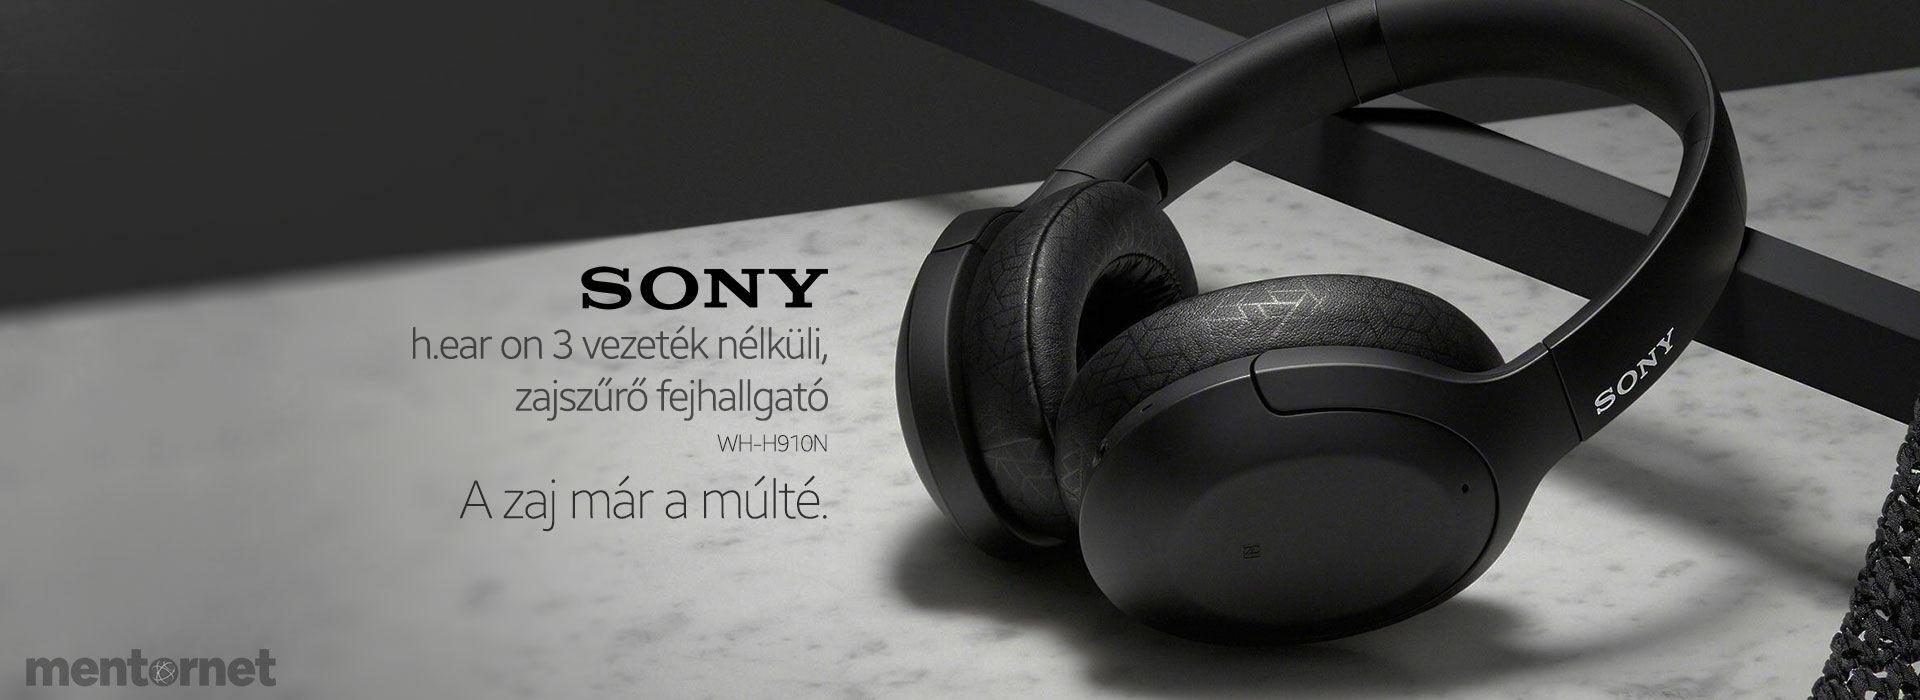 sony_whh910n